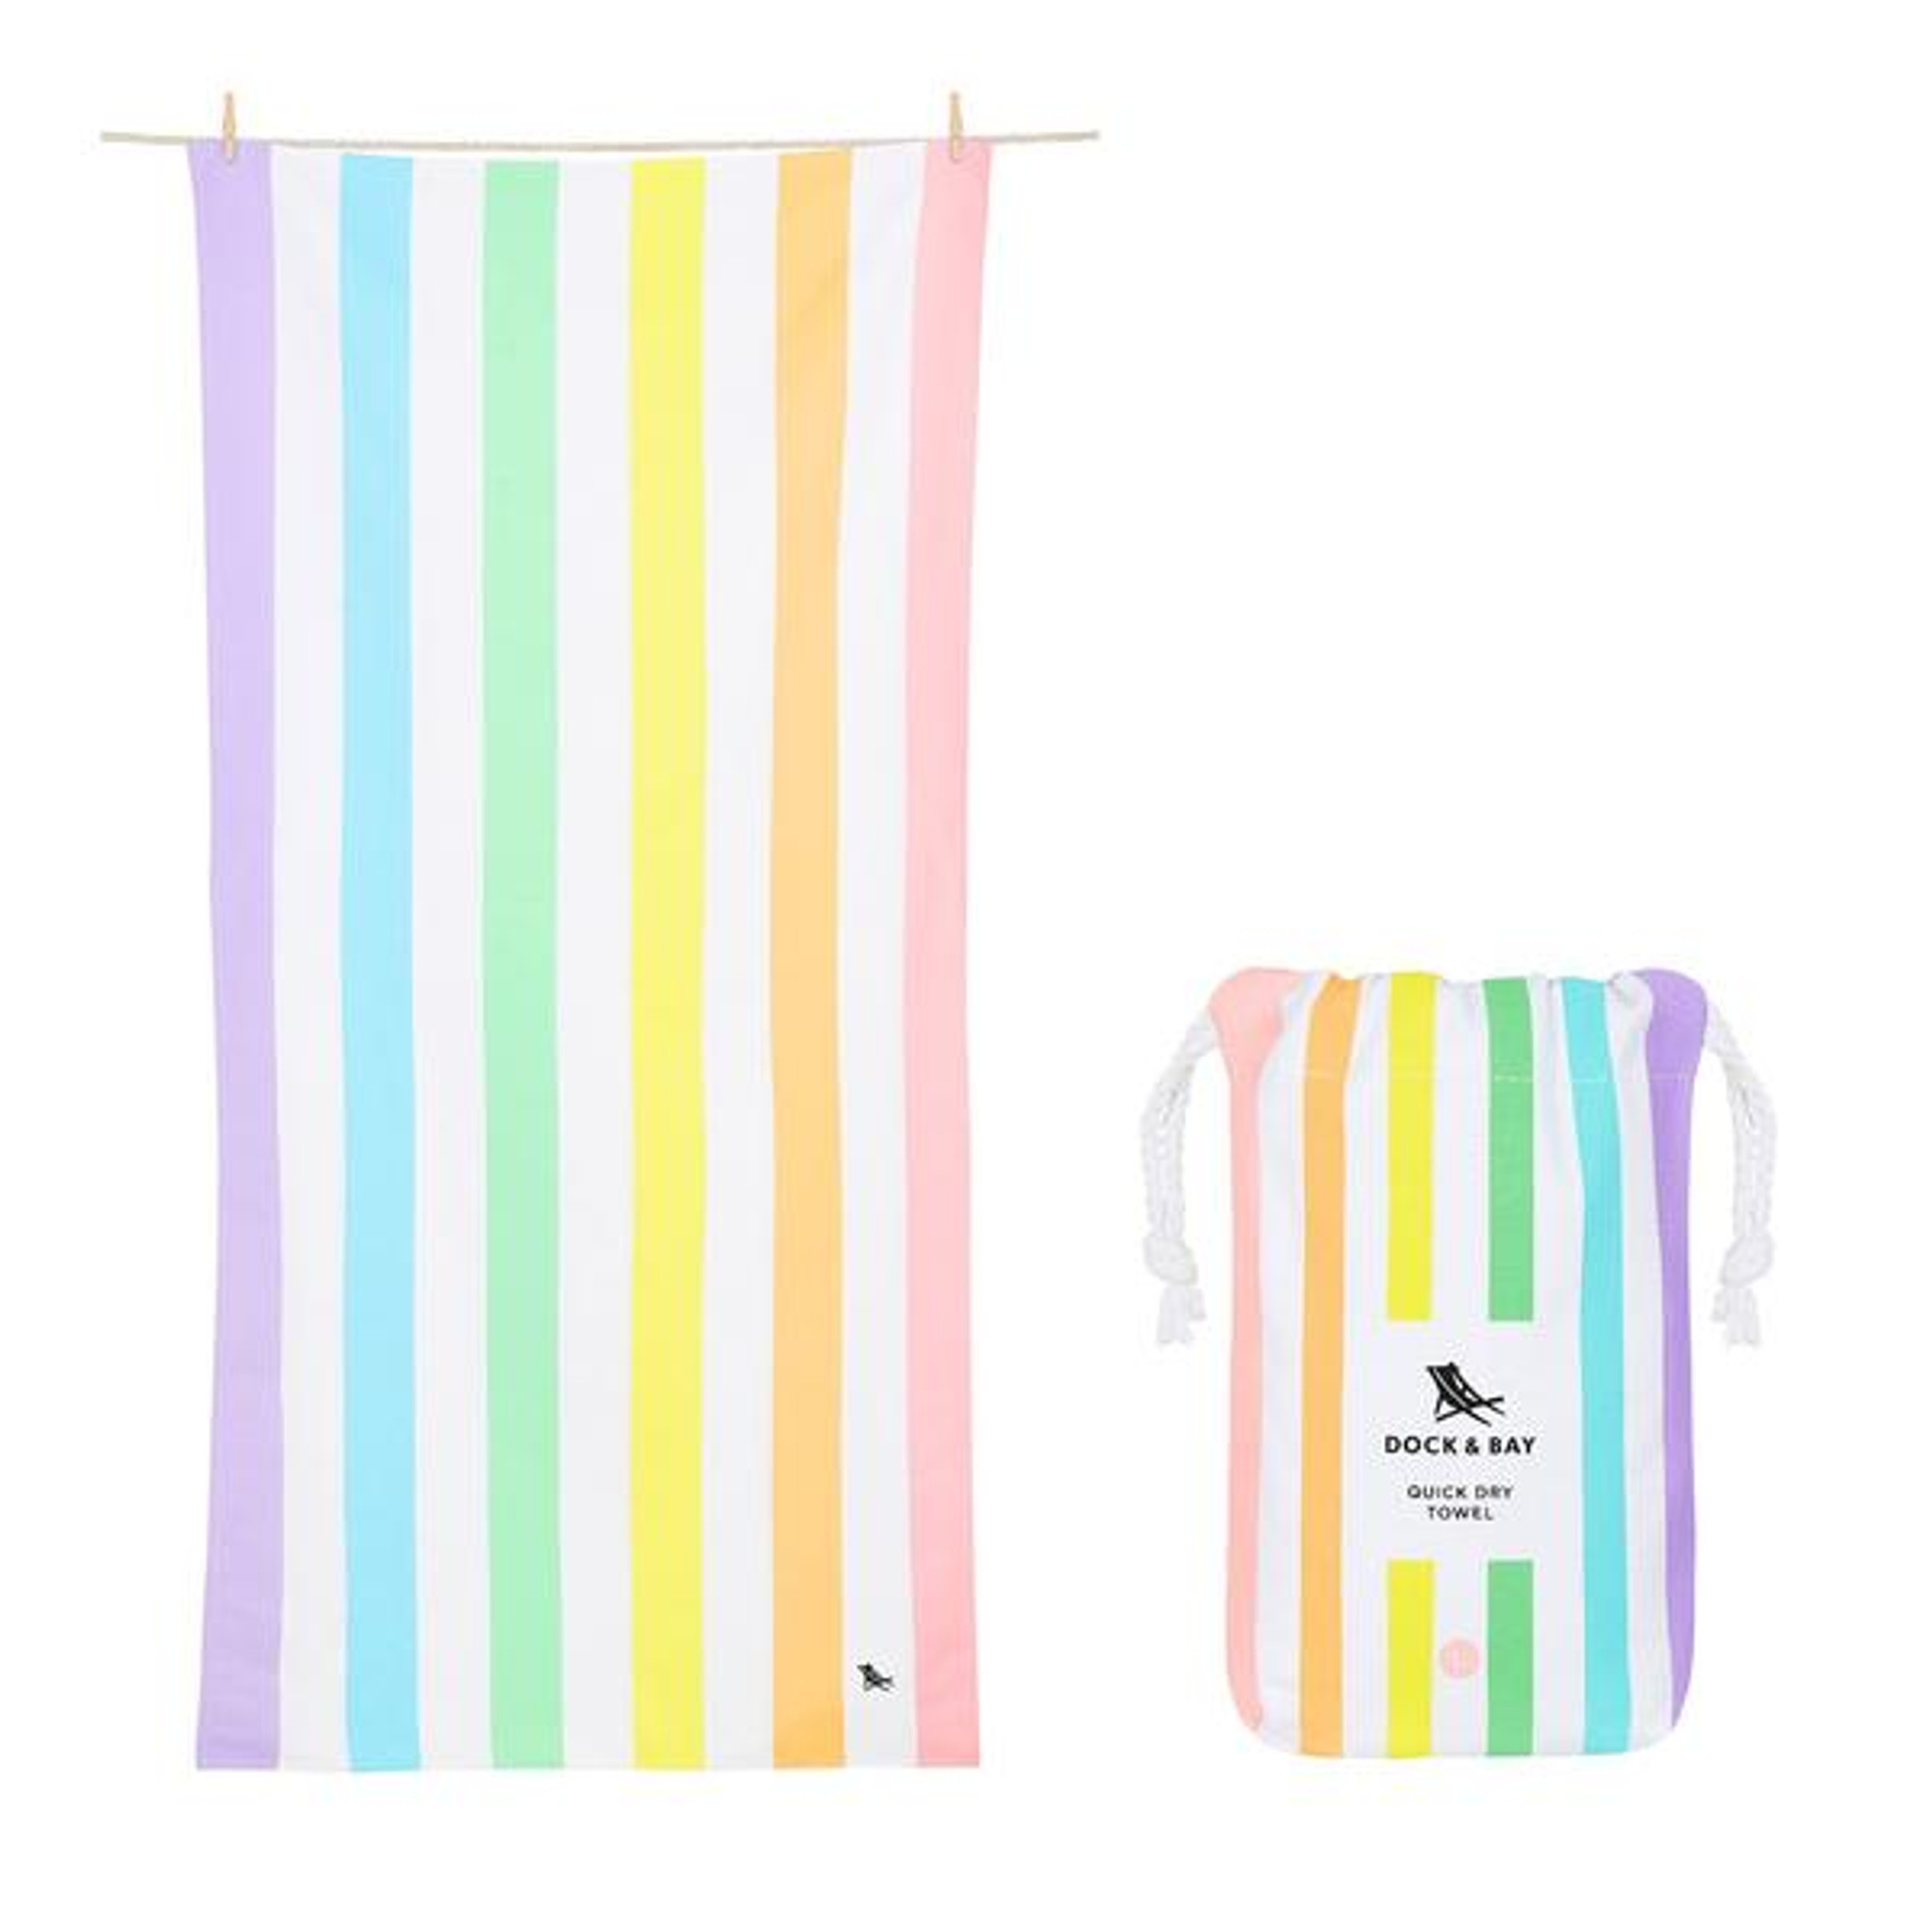 Dock & Bay Quick-Dry Large Towel - Unicorn Waves